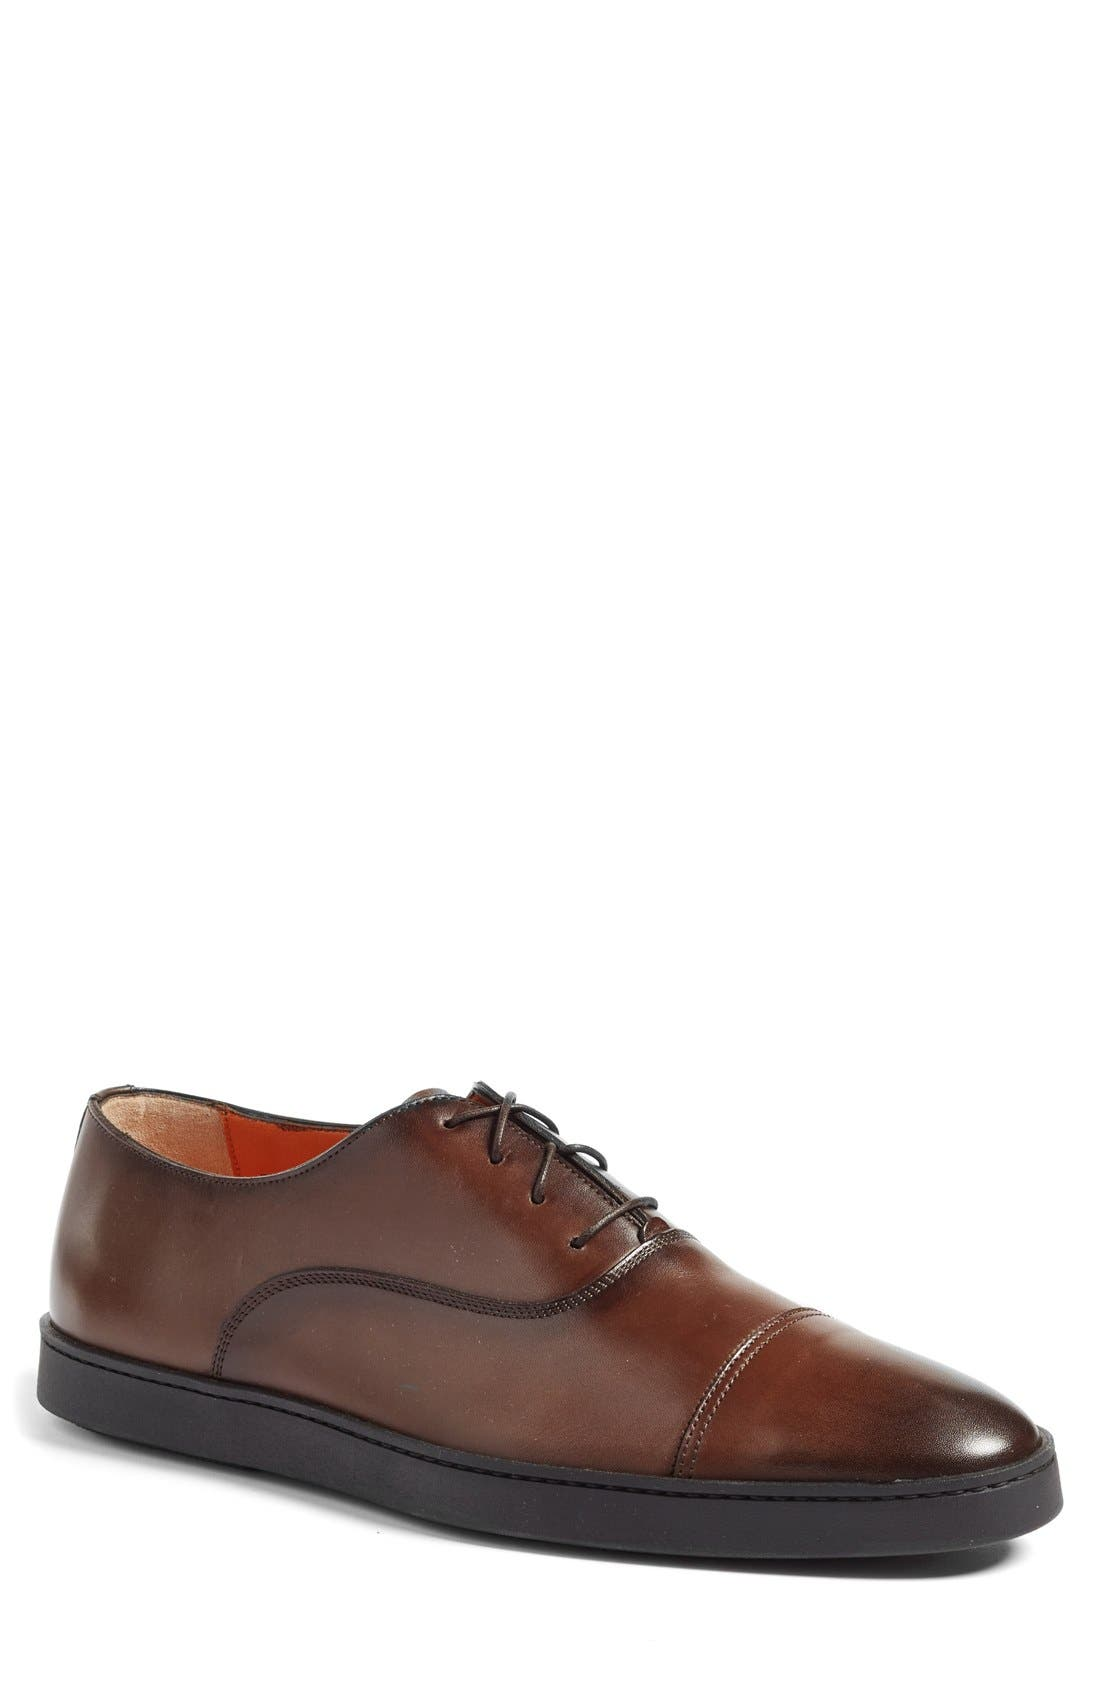 Alternate Image 1 Selected - Santoni 'Durbin' Oxford Sneaker (Men)